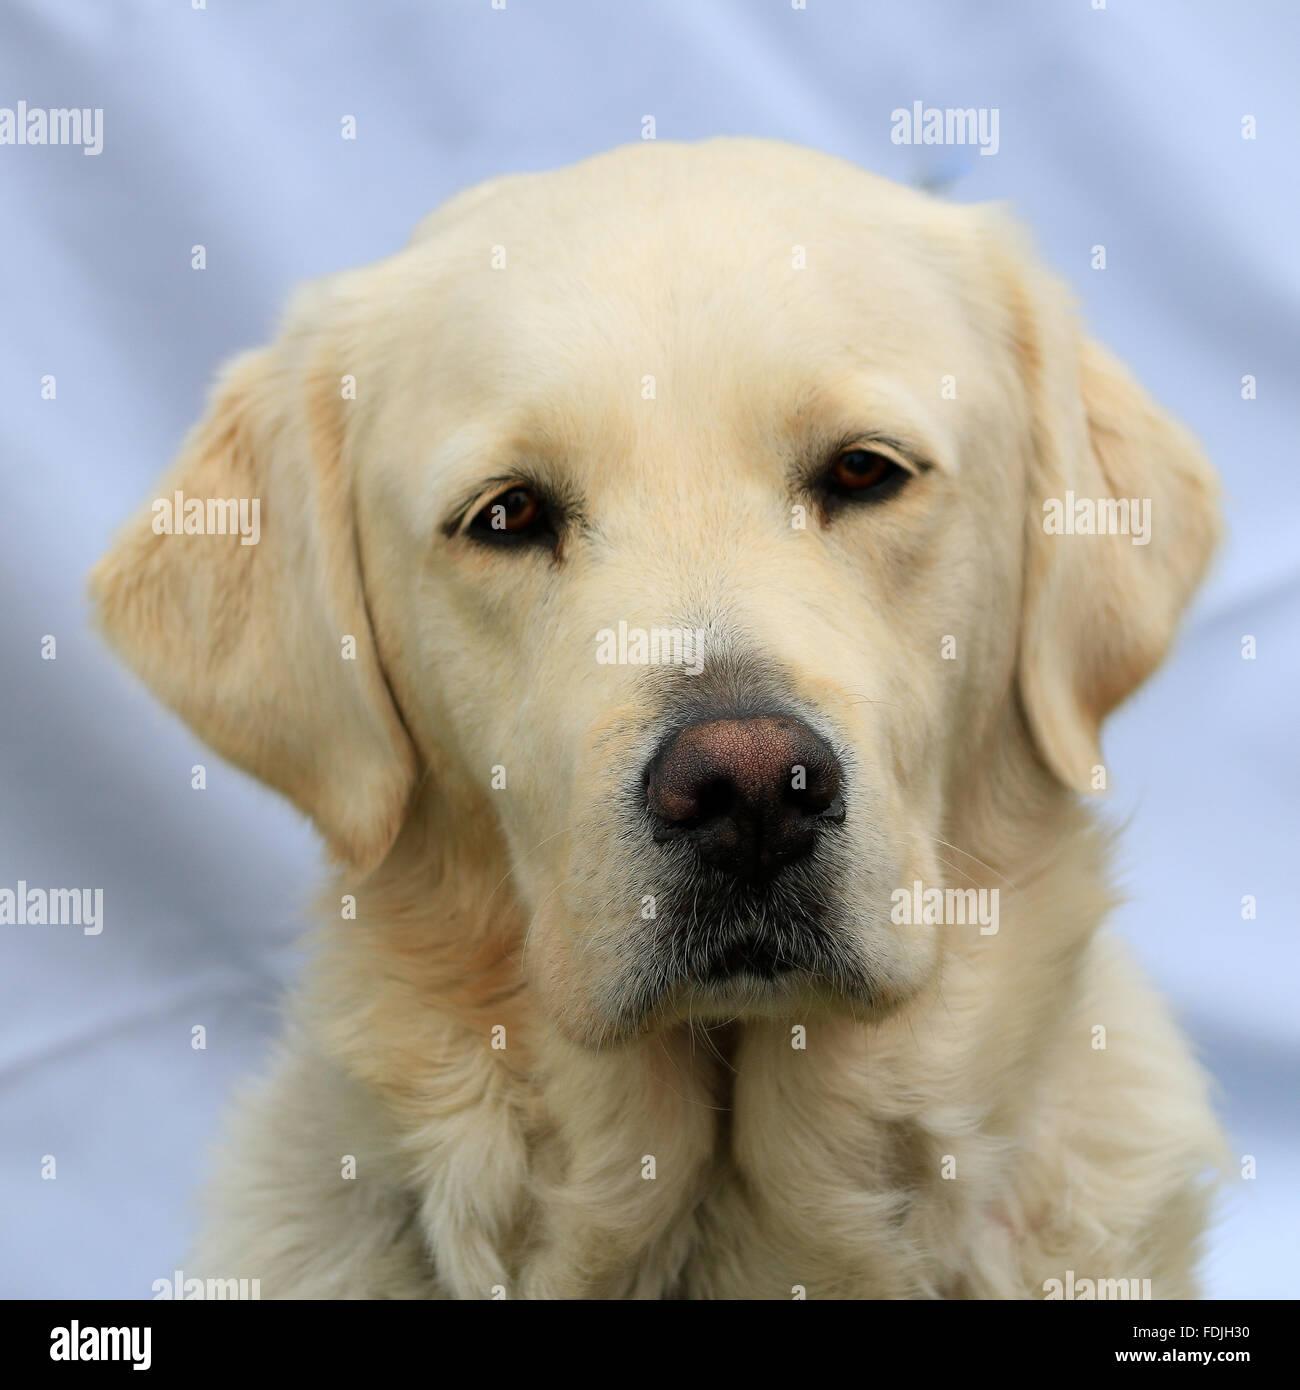 Headshot of a yellow labrador dog - Stock Image